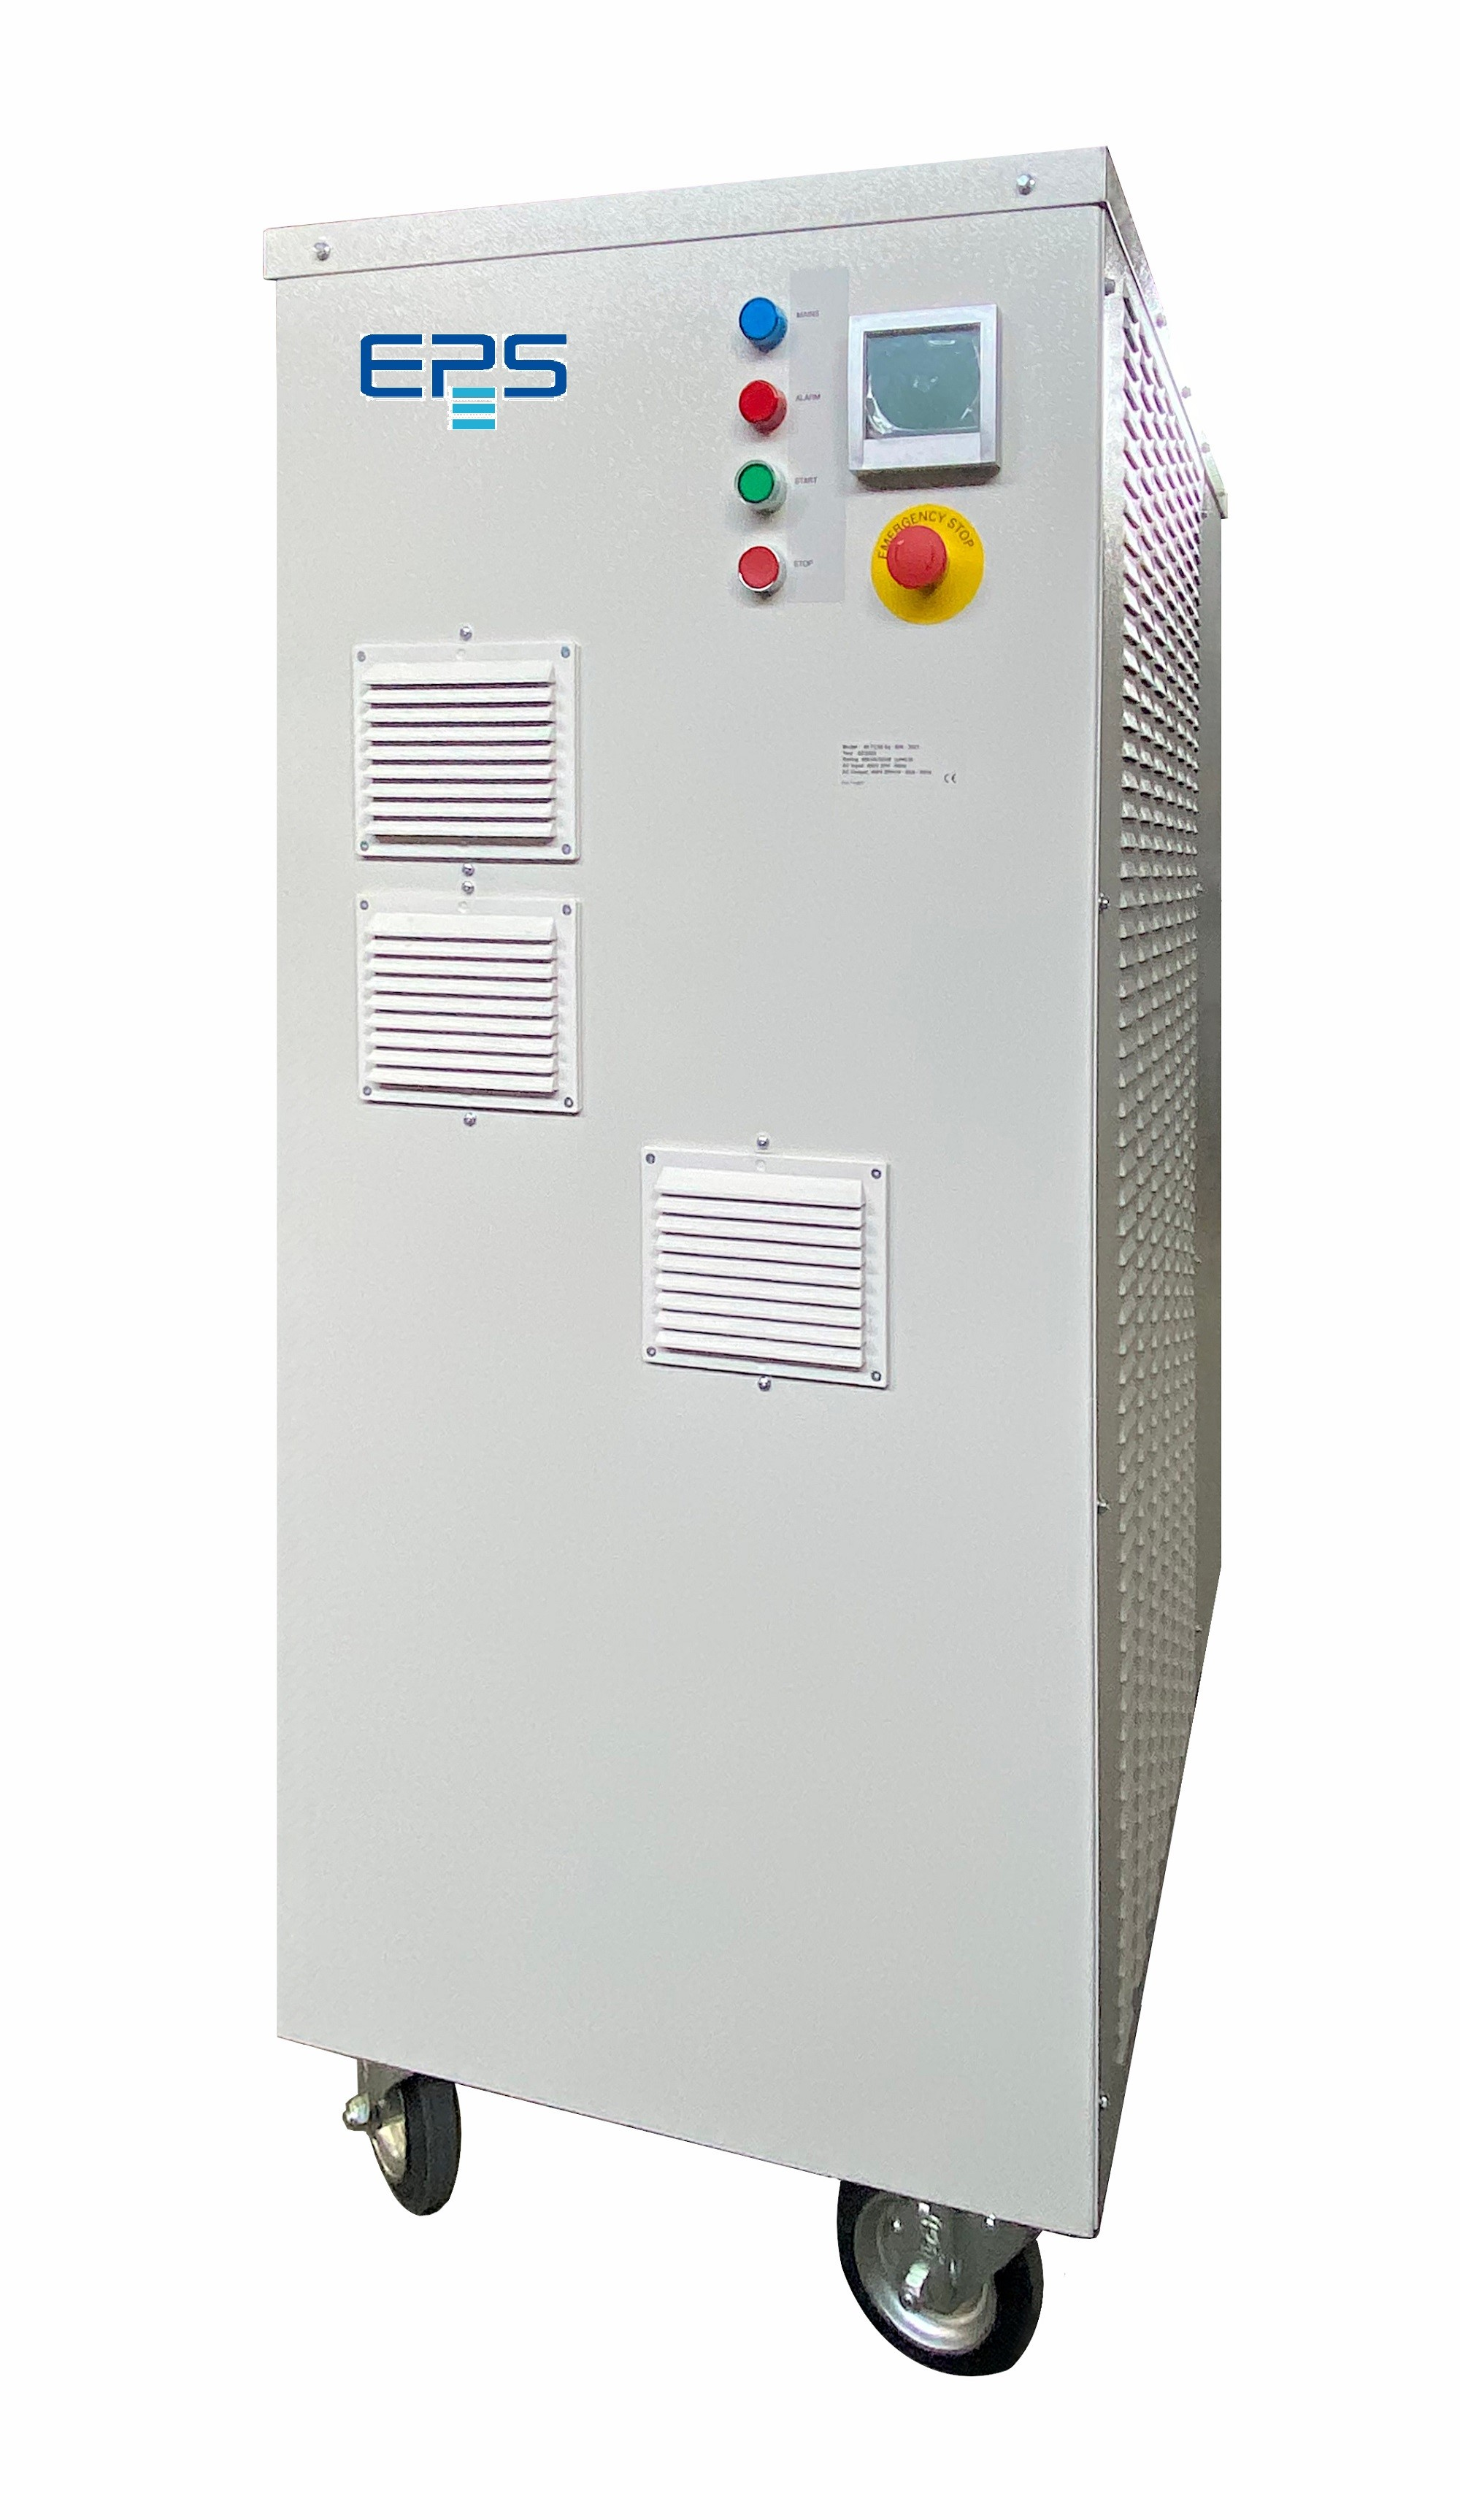 EPS/FC 10-315 TEST Avionik Konverter 10-315 kVA